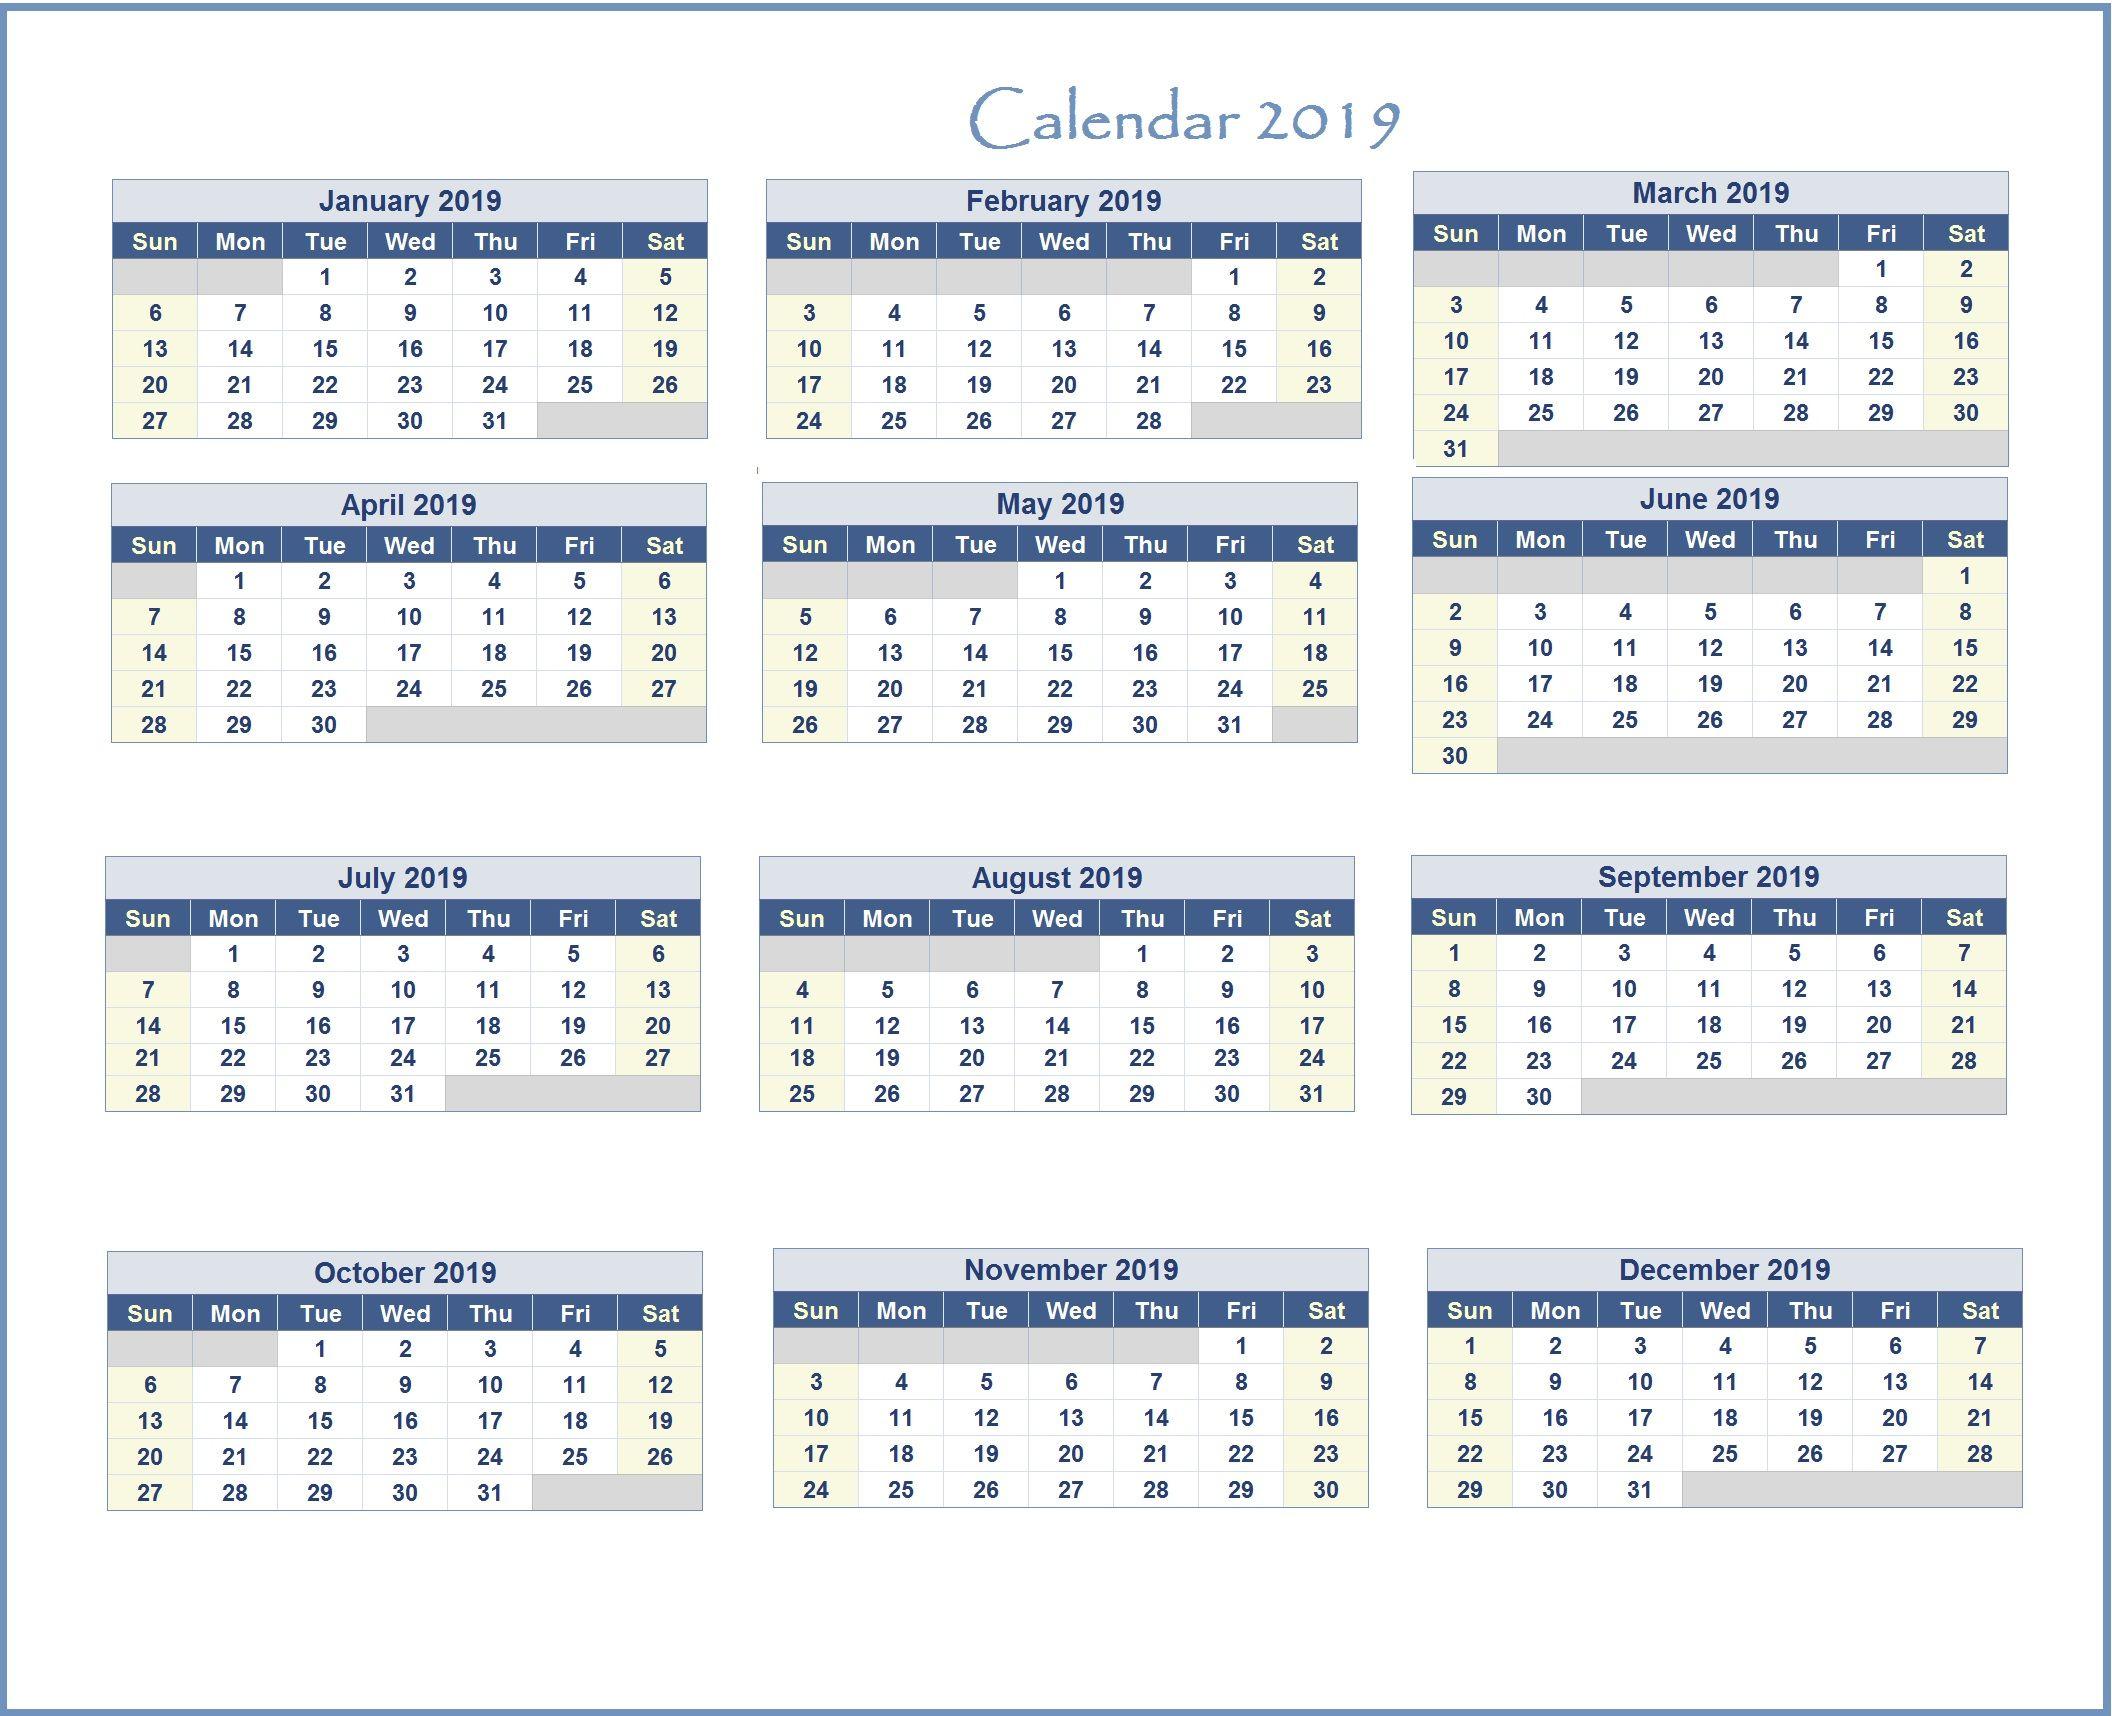 Free Excel Calendar 2019 2019 Excel Calendar | Monthly Calendar Templates | Excel calendar